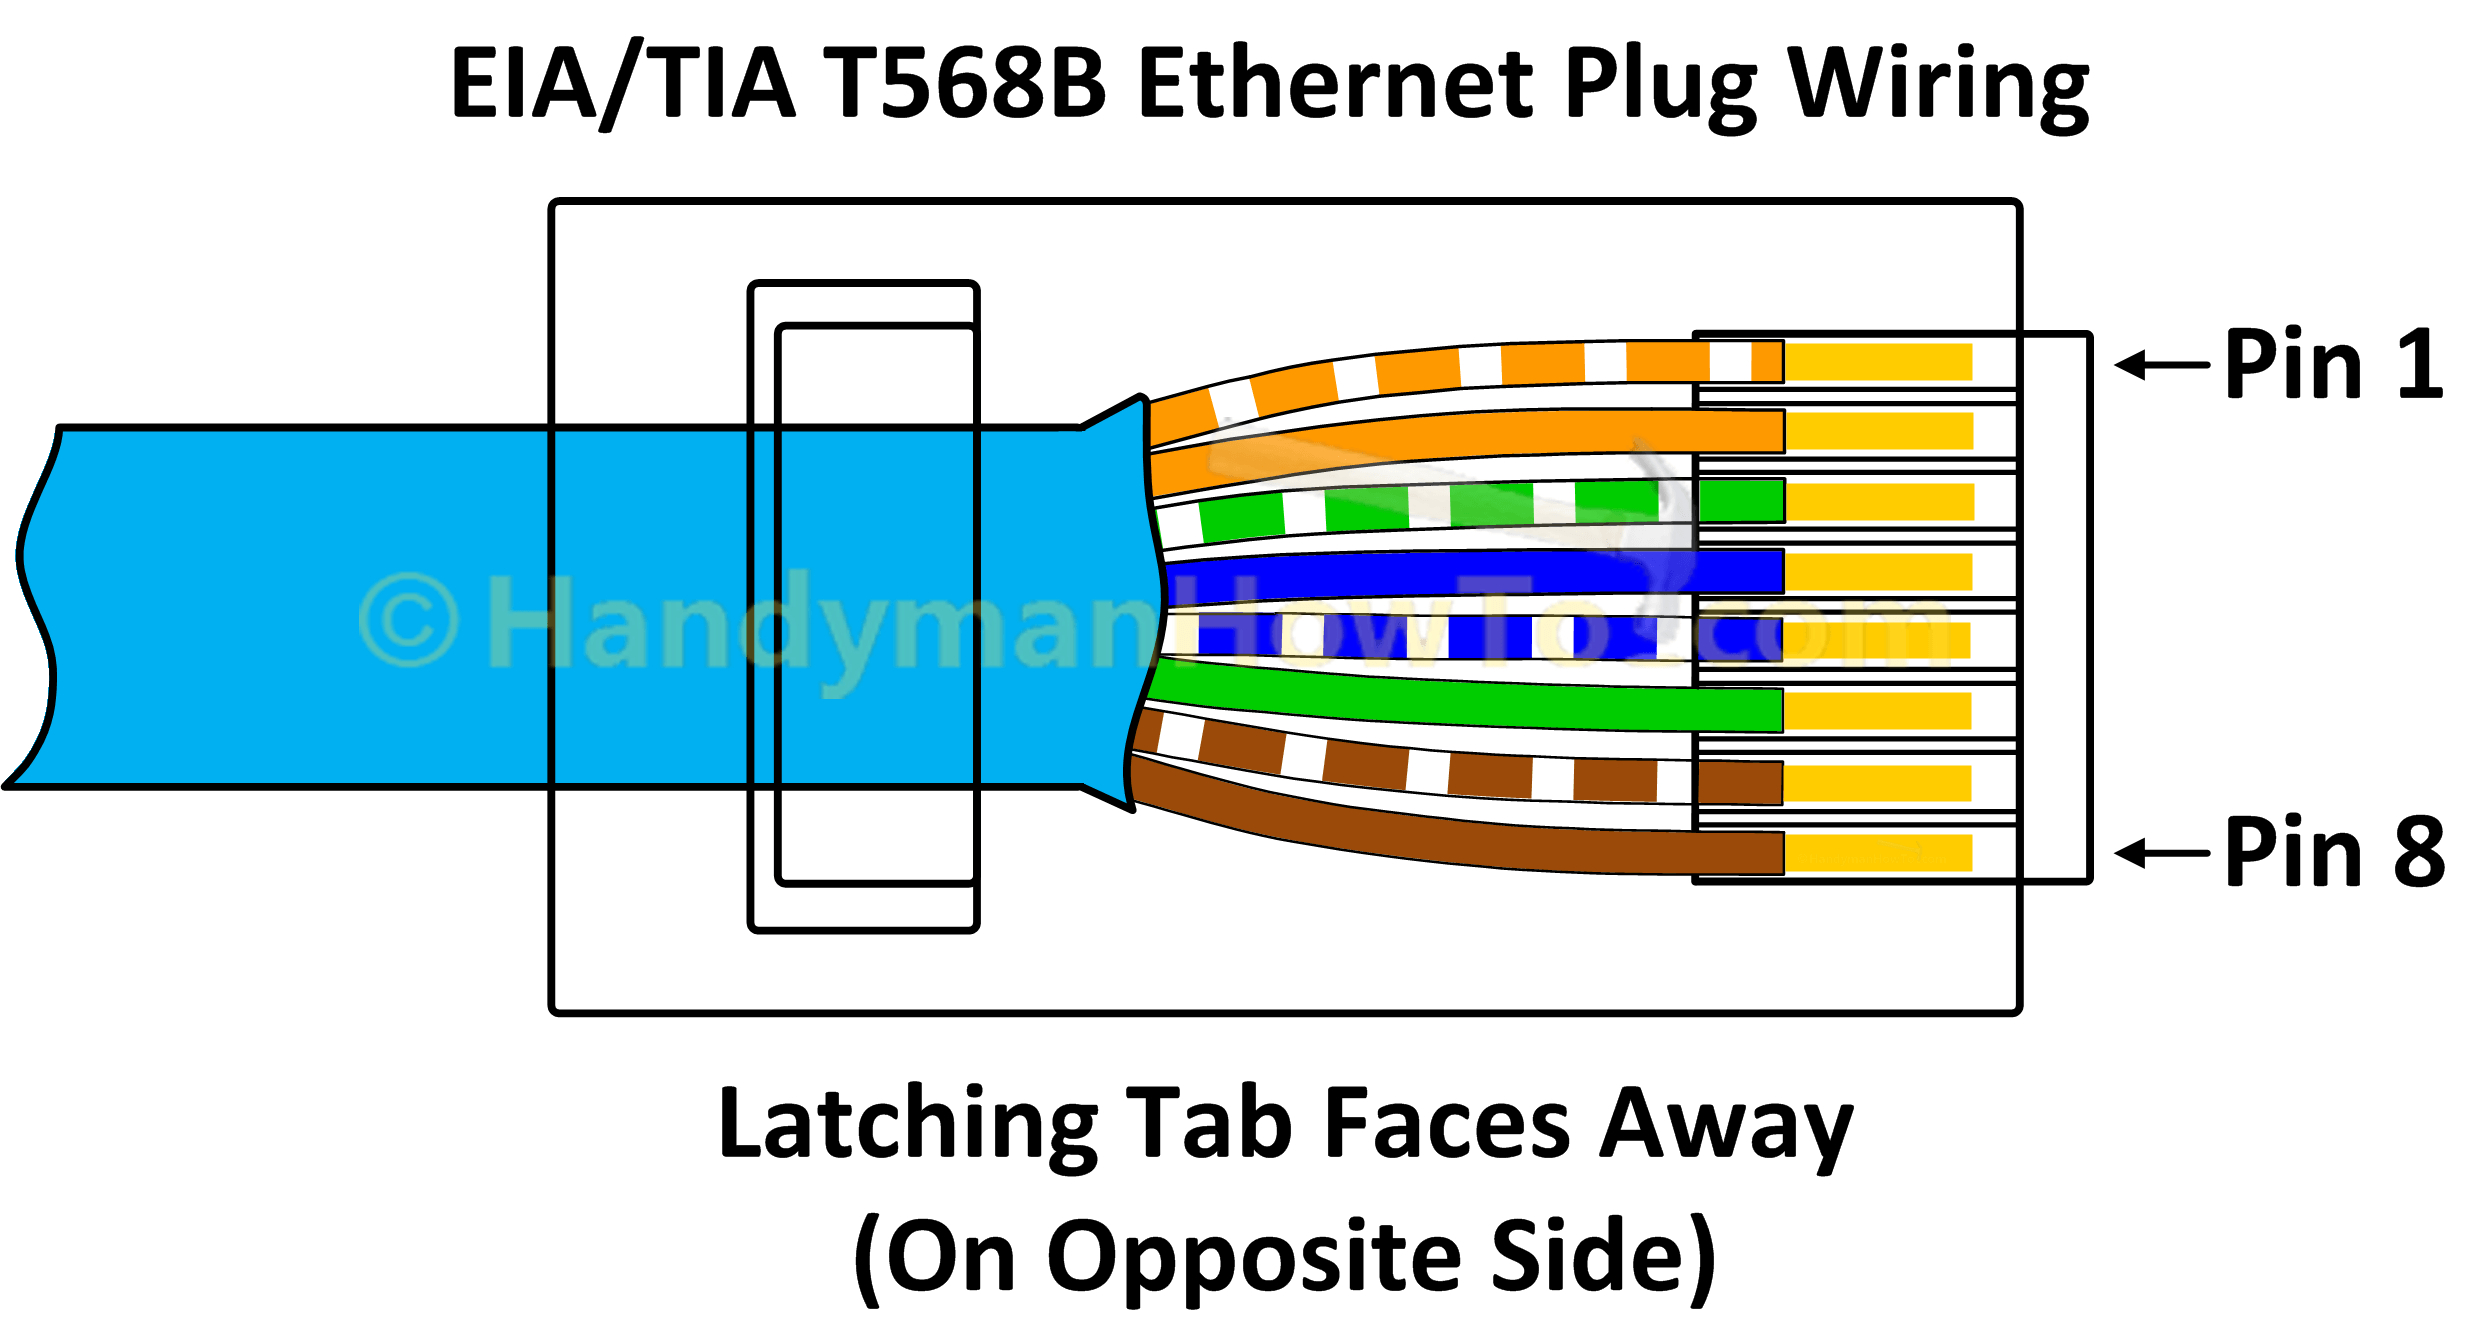 Cat 3 Wiring Diagram | Wiring Diagram - Cat 3 Wiring Diagram